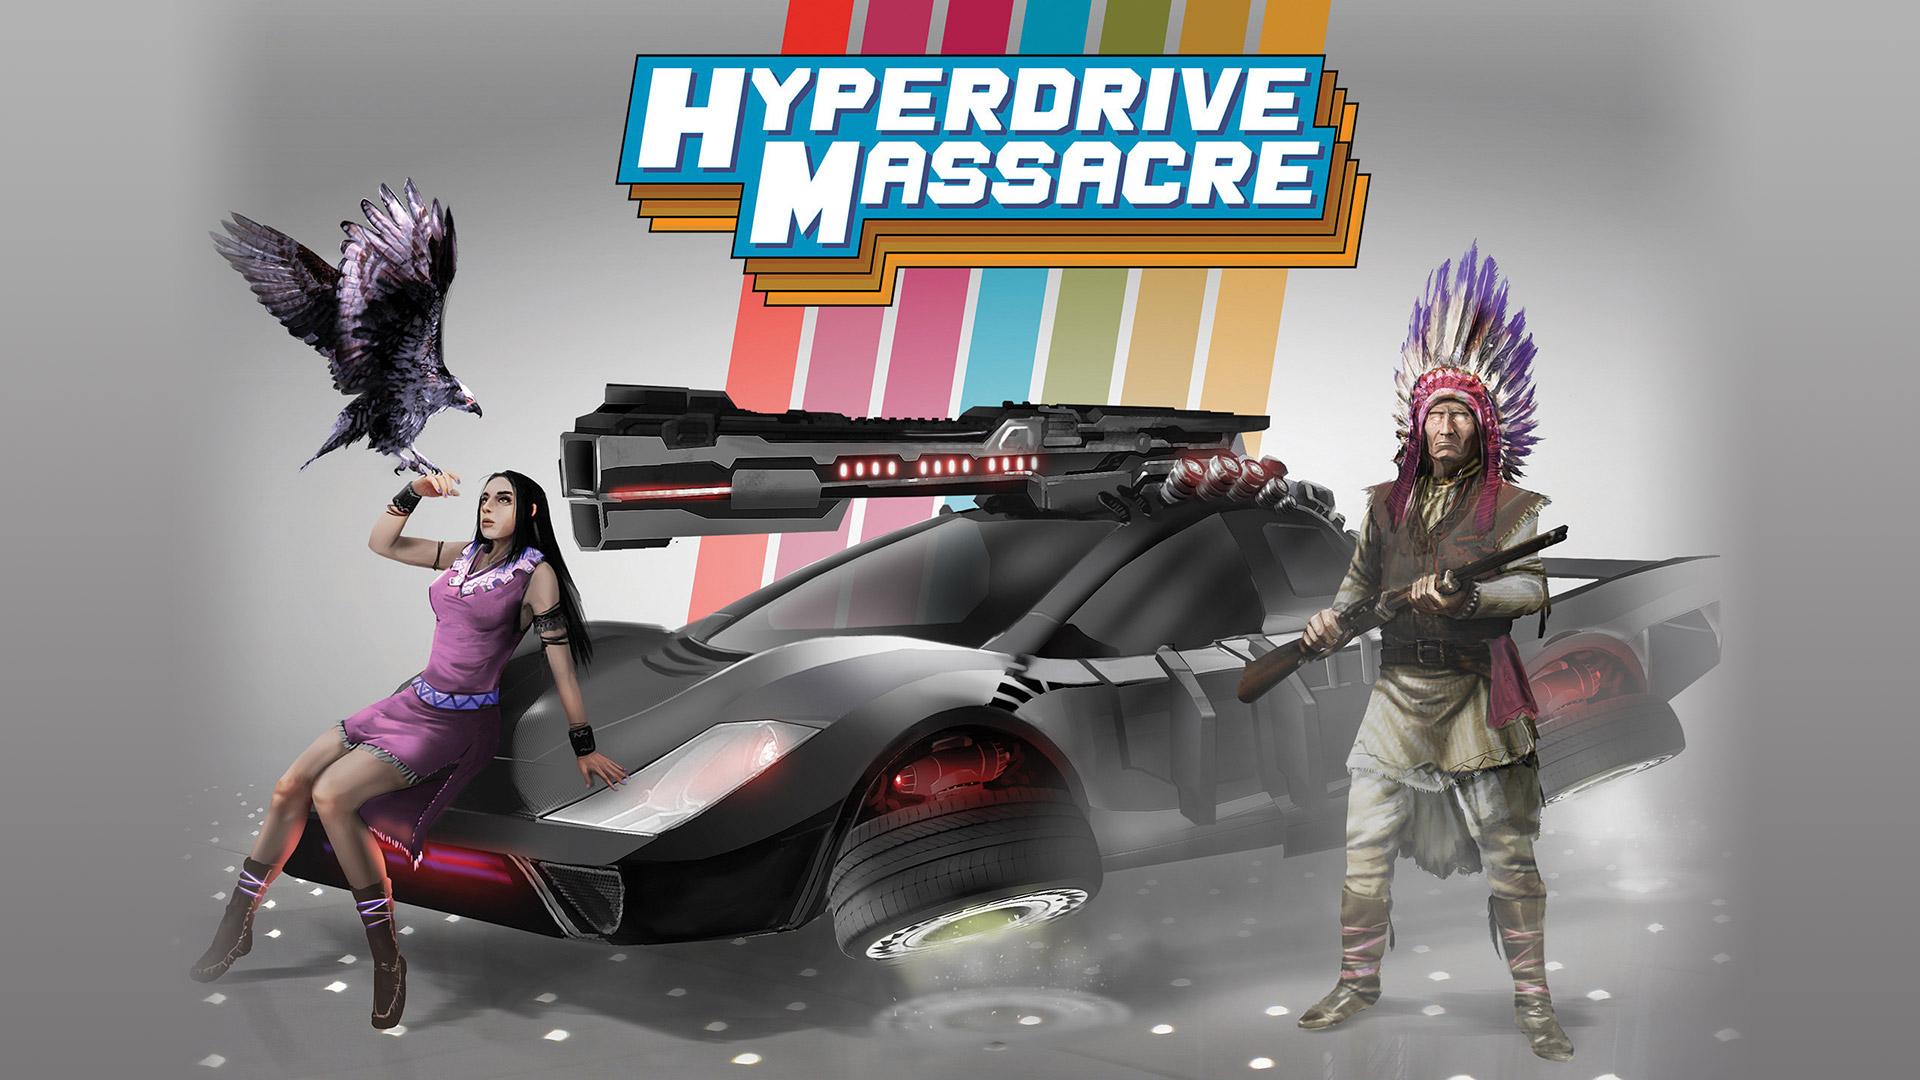 Hyperdrive Massacre Wallpaper in 1920x1080